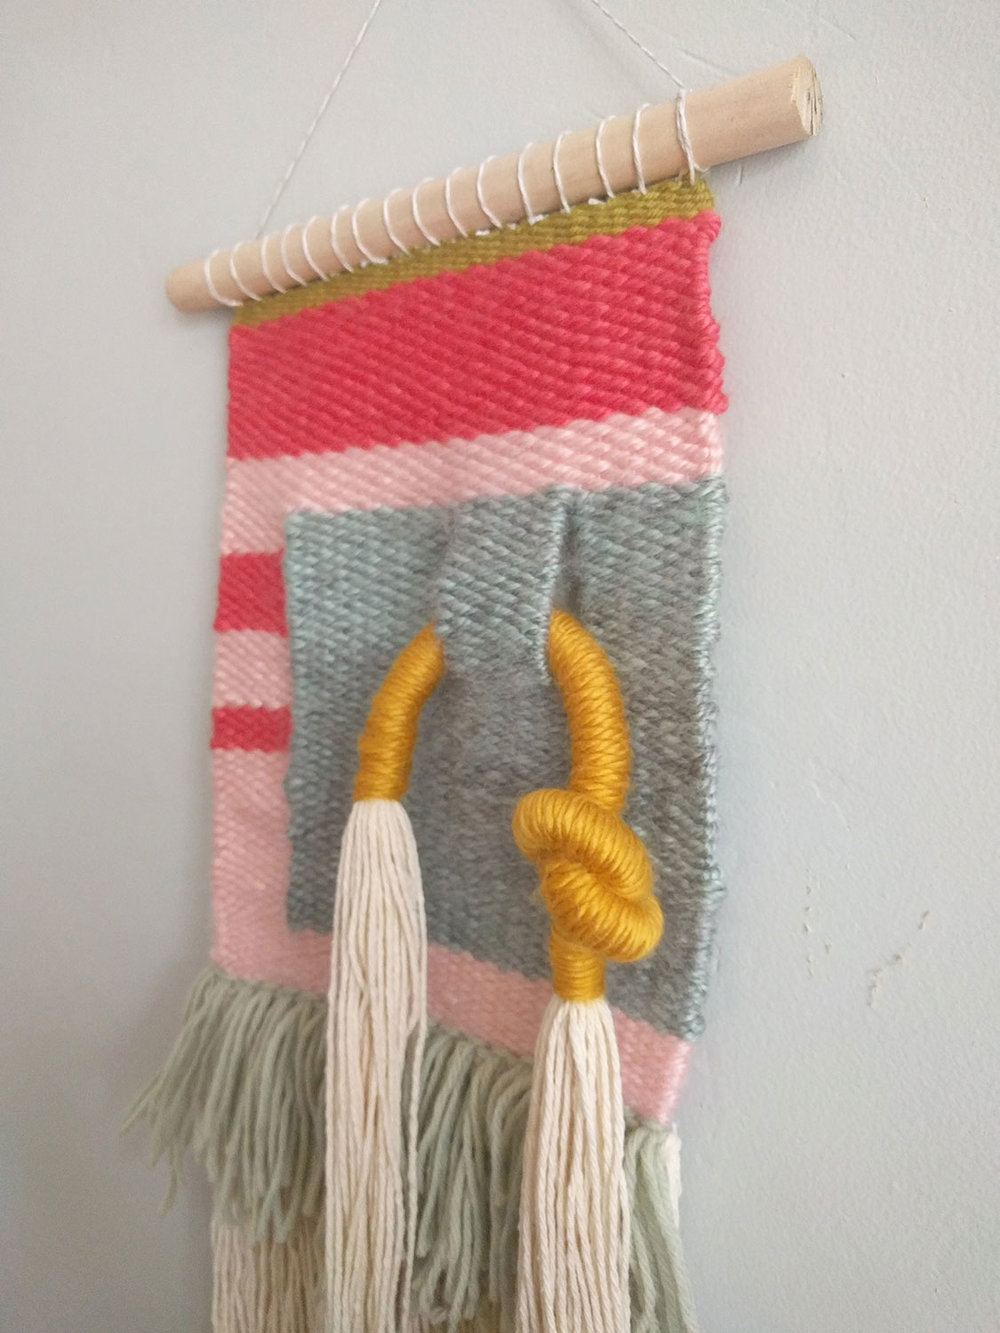 Weaving-3.jpg